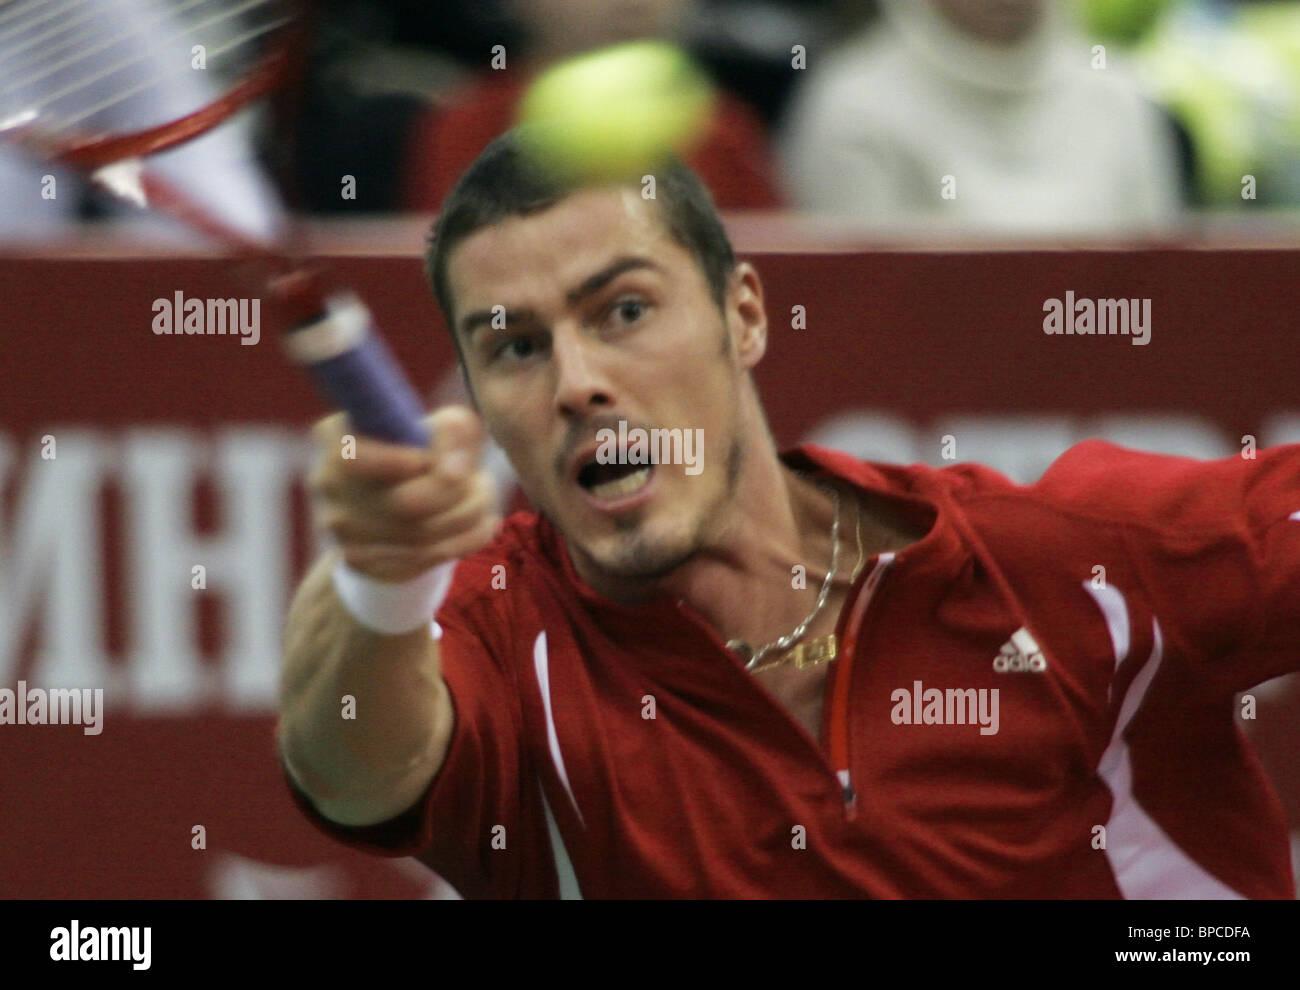 Kremlin Cup tennis tournament 1/4 final - Stock Image